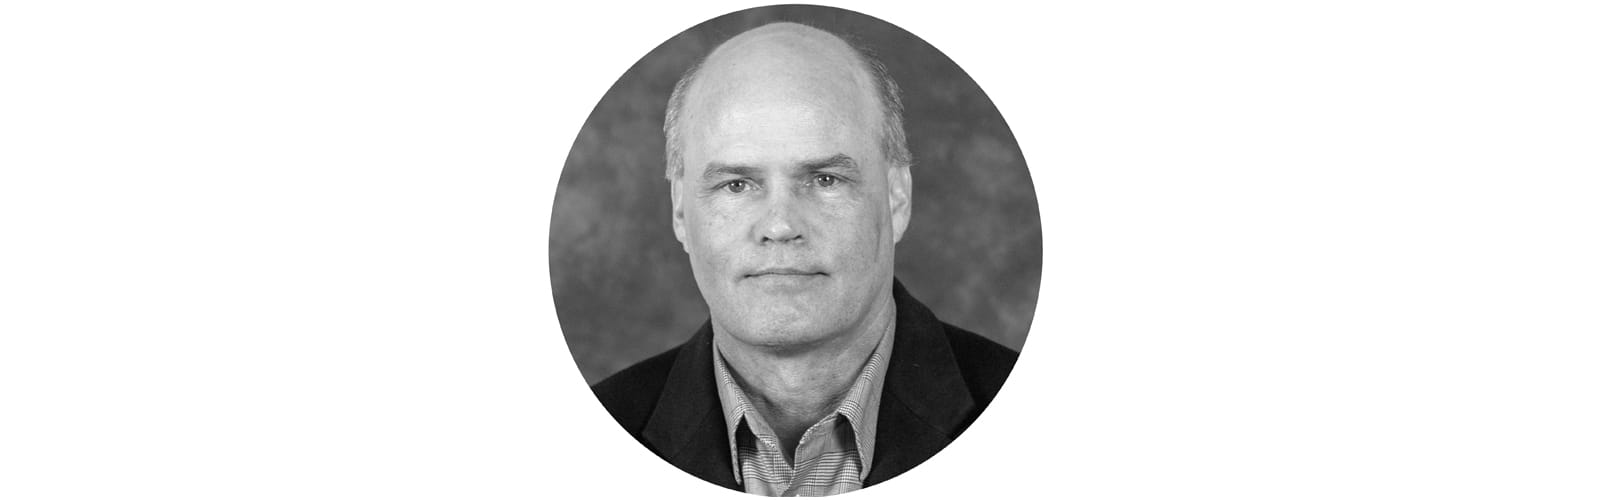 Professor Thomas Joiner